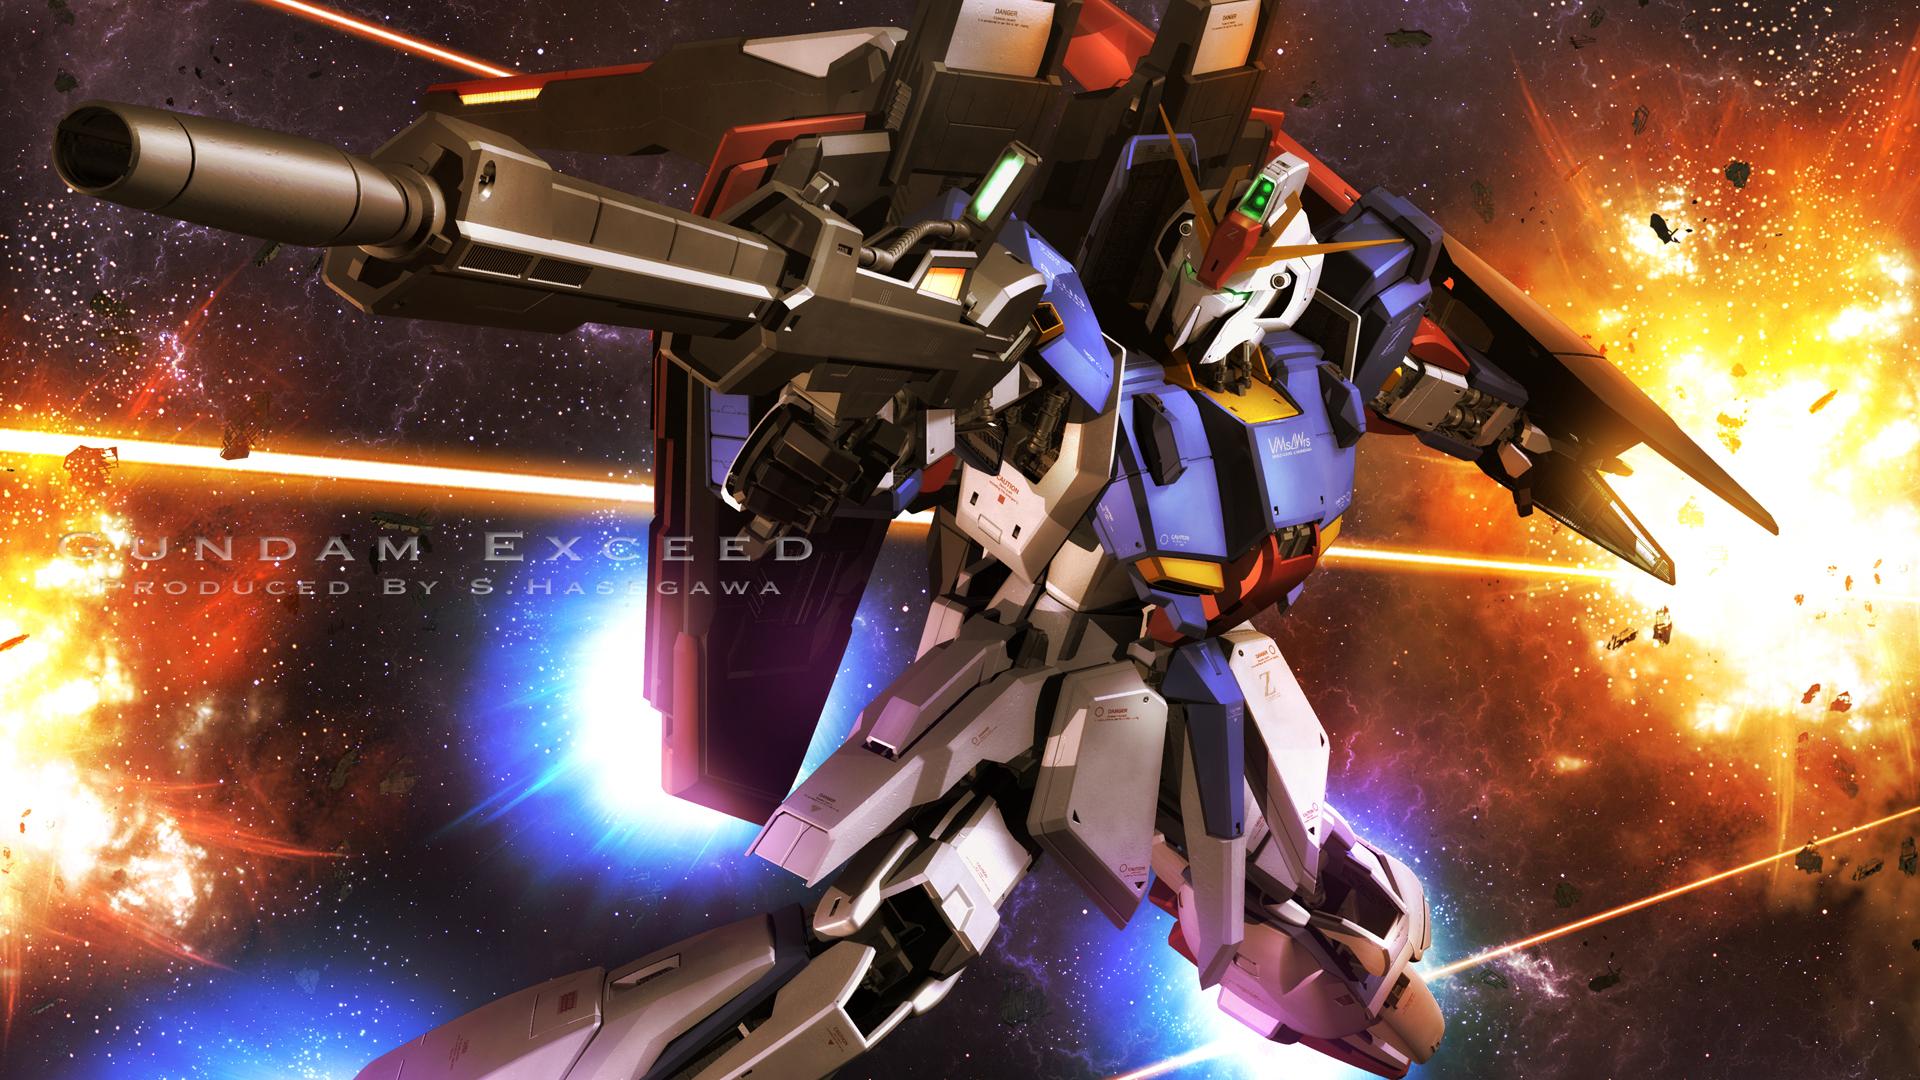 Mobile Suit Gundam Image 2318406 Zerochan Anime Image Board